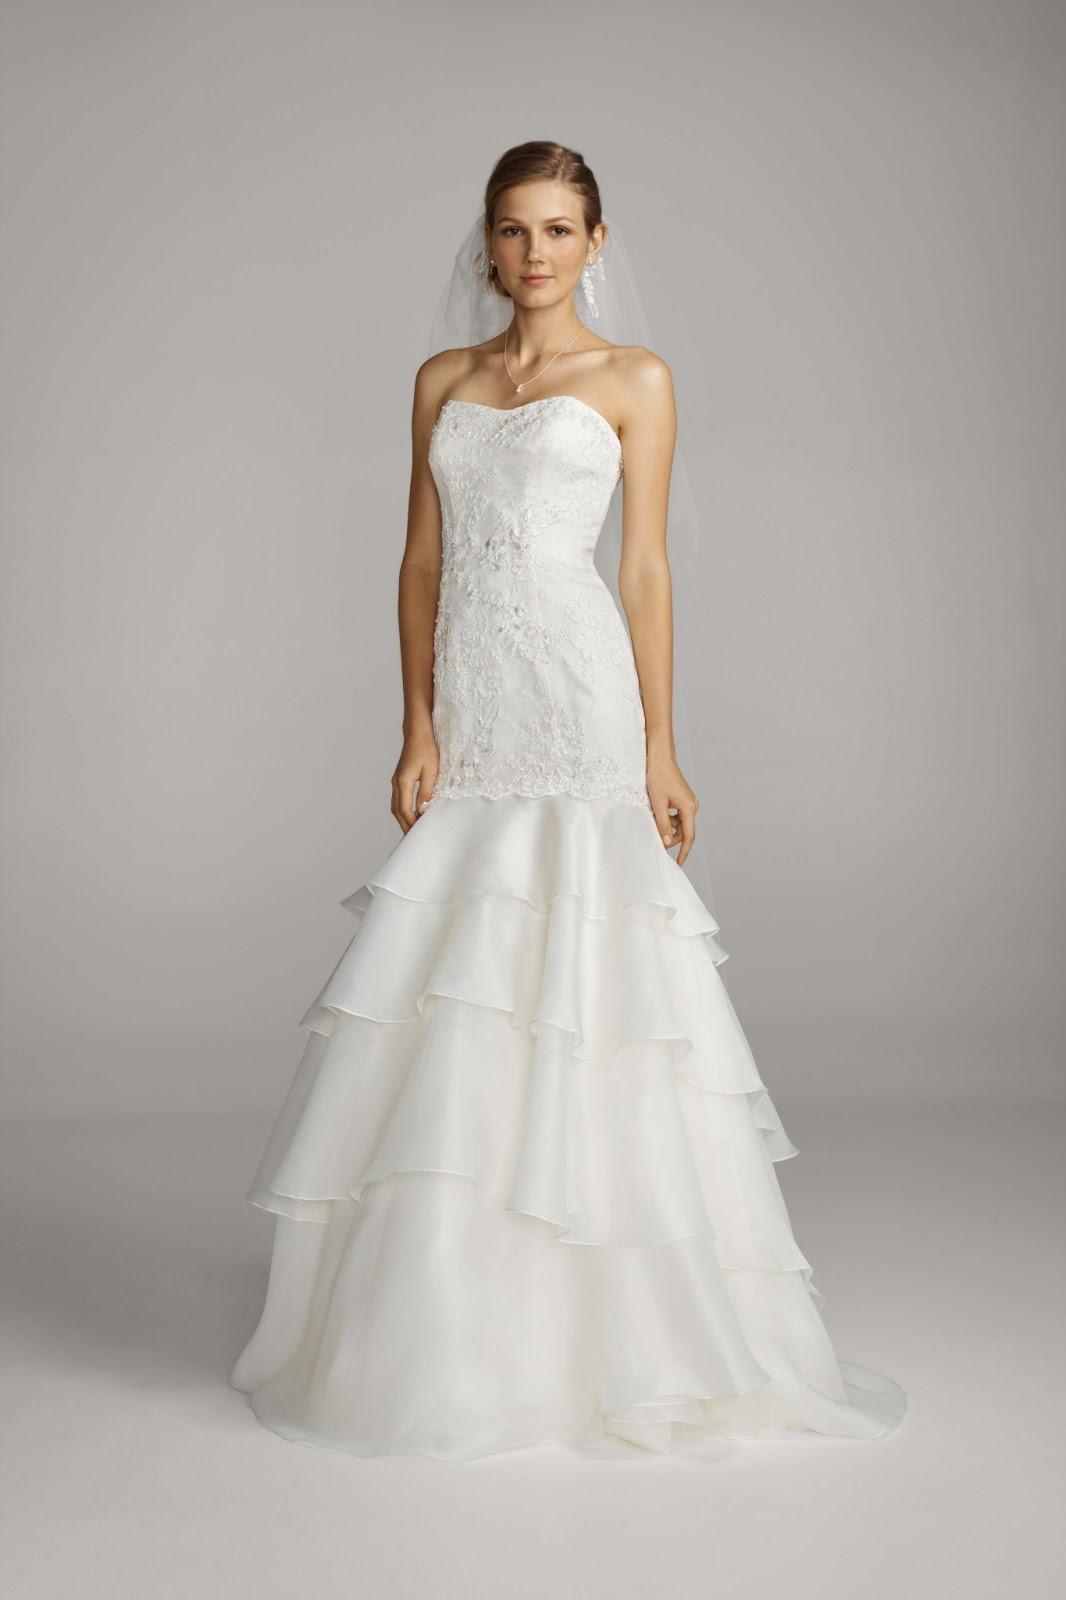 2013 Wedding Dress Melissa Sweet For Davids Bridal 0335